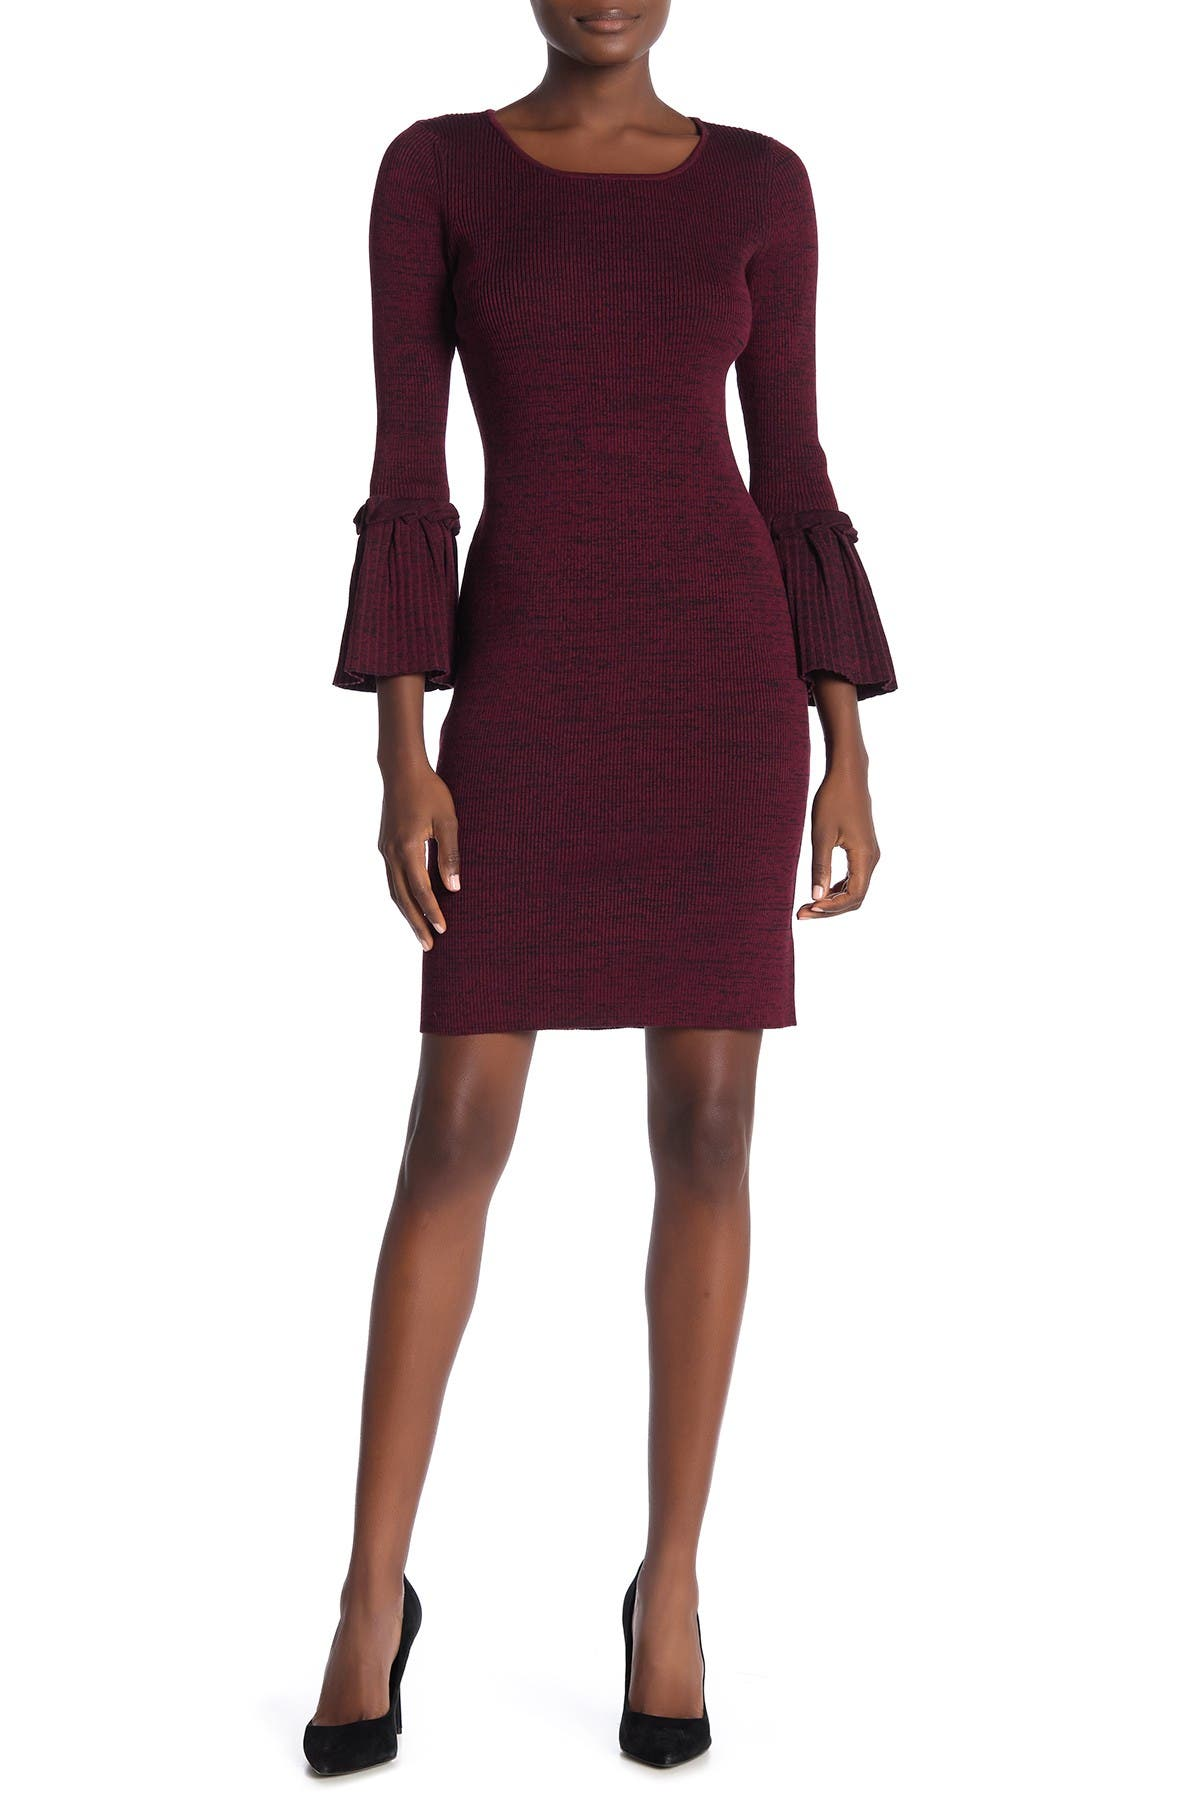 Image of Nina Leonard Ribbed Knit Bell Sleeve Sweater Dress